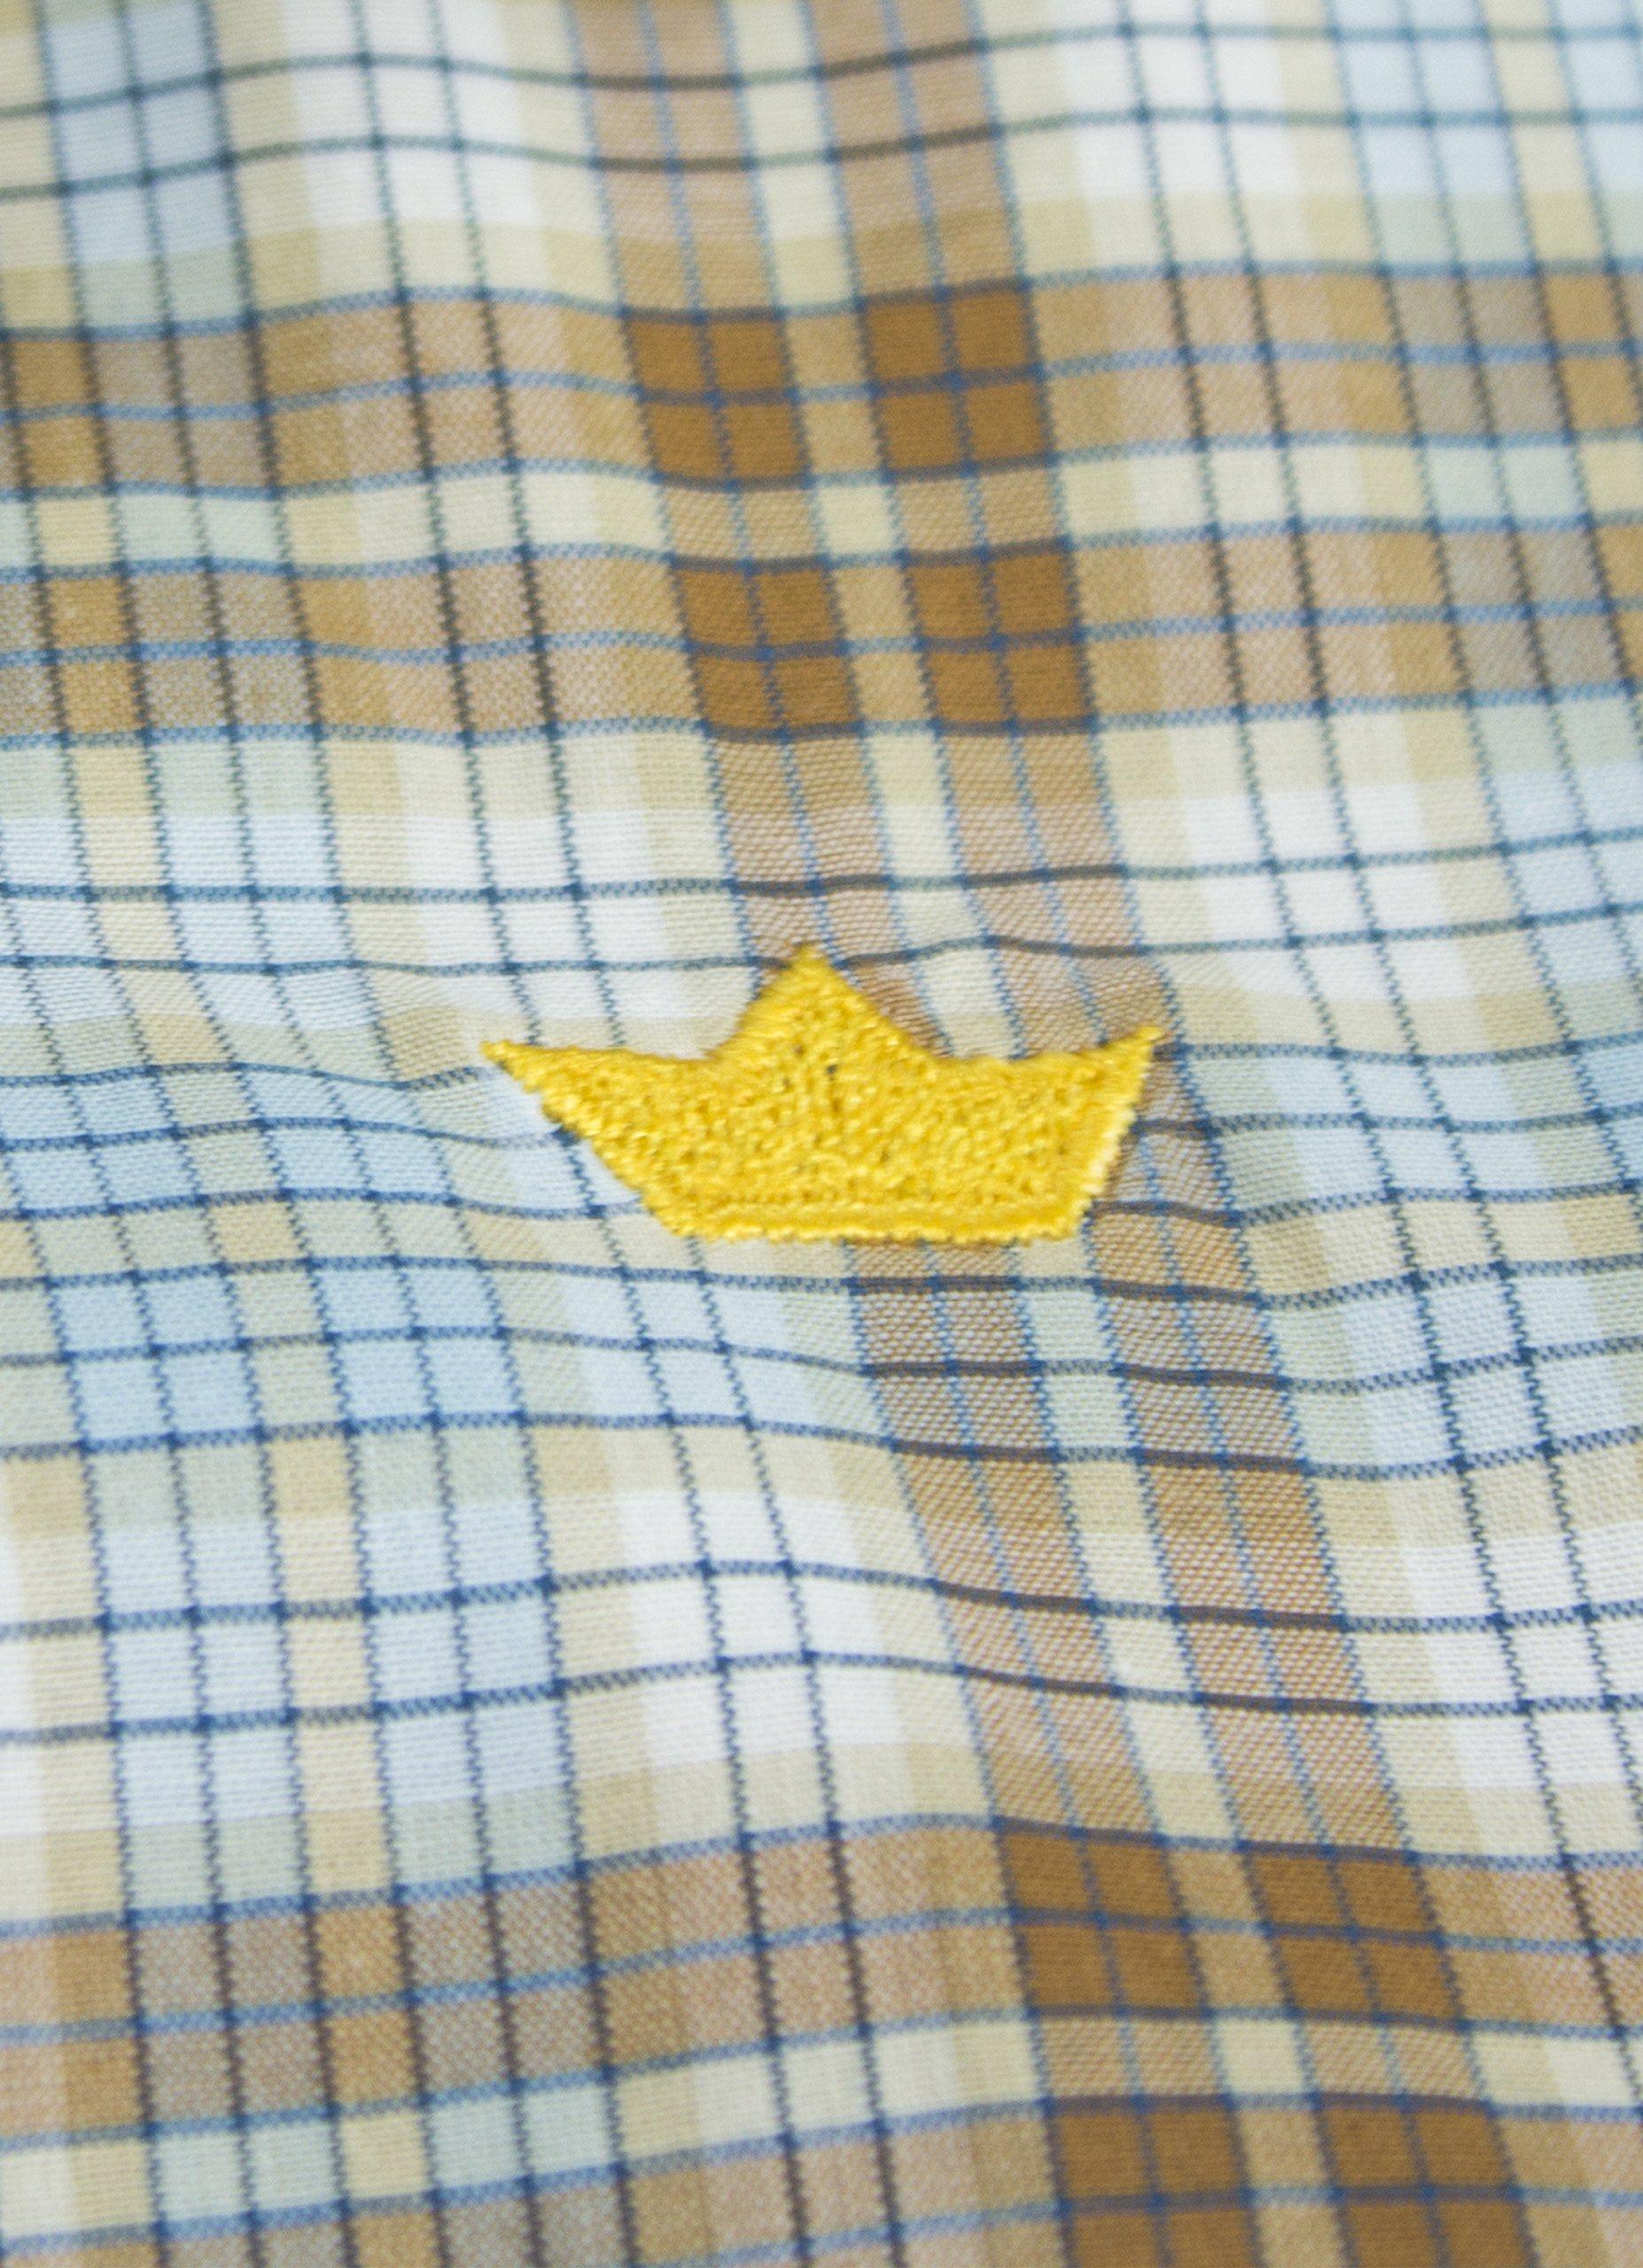 Dakomoda Toddler Boys' Short Sleeve Easter Shirt Brown Plaid Check 100% Pima Cotton Dress Shirt 3T by Dakomoda (Image #3)